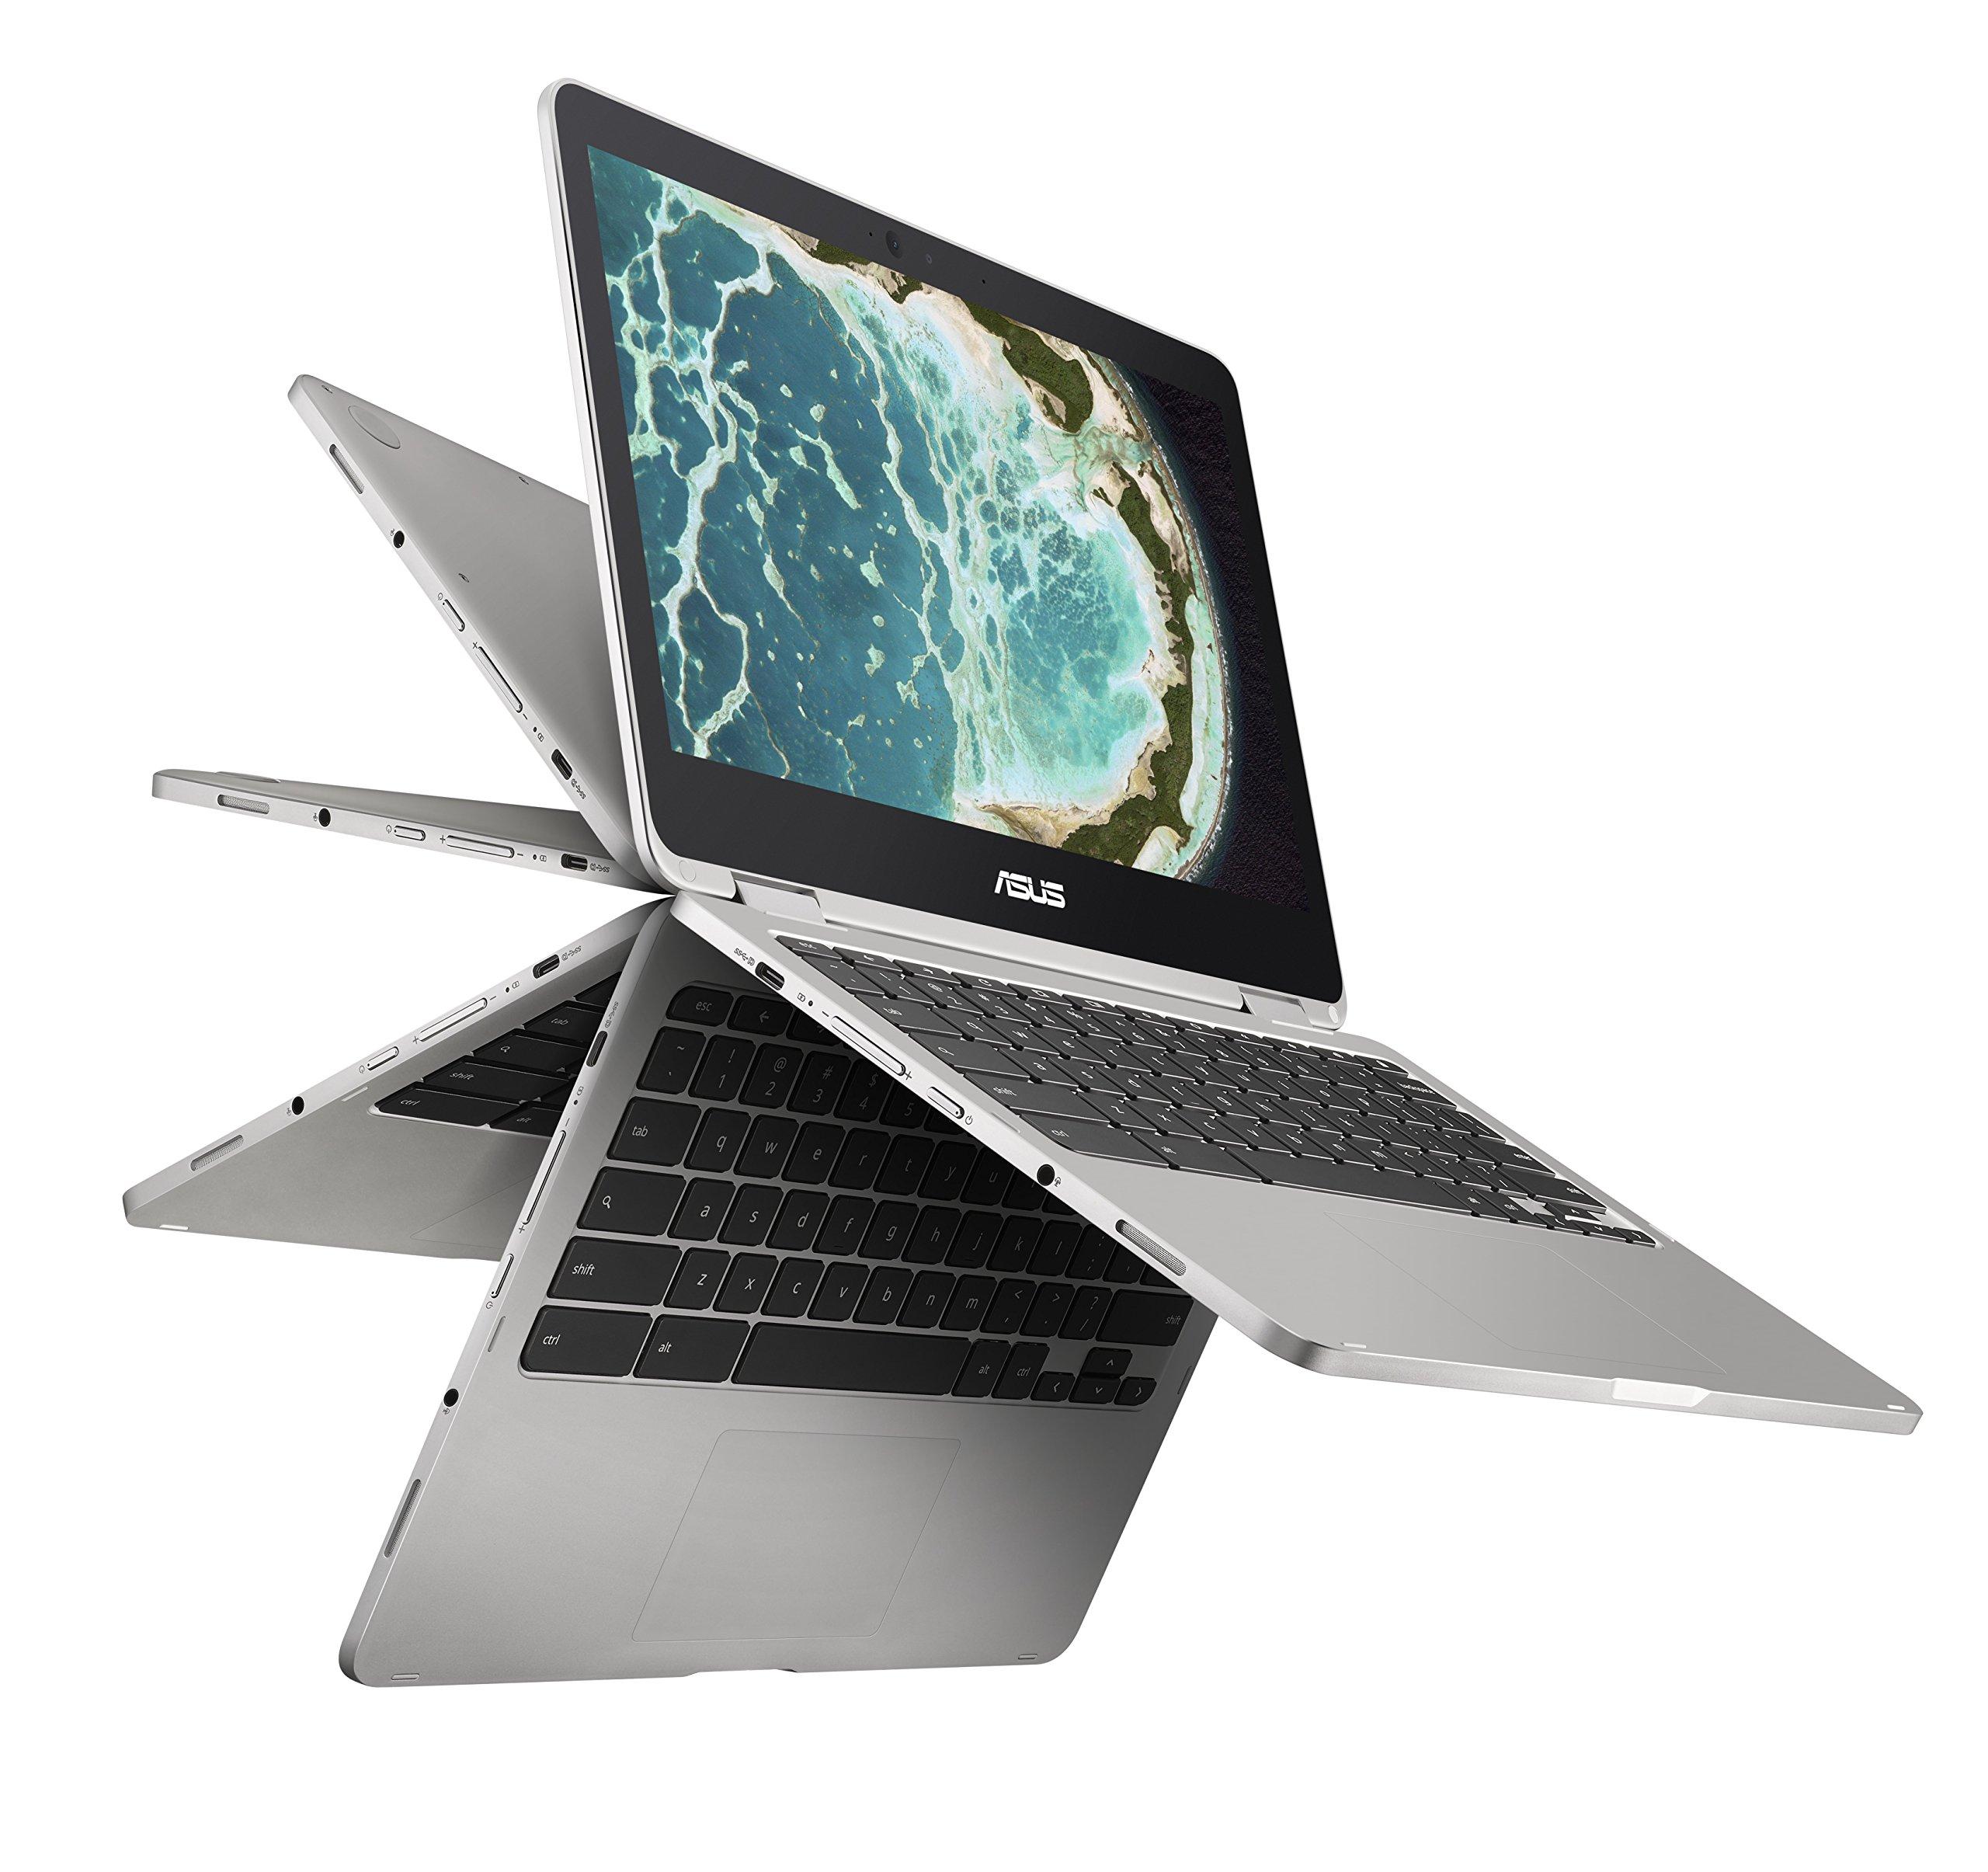 Asus C302CA-DHM4 Chromebook Flip 12.5-Inch Touchscreen Convertible Chromebook, Intel Core M3, 4GB RAM, 64GB Flash Storage, All-Metal Body, USB Type C, Corning Gorilla Glass, Chrome OS by ASUS